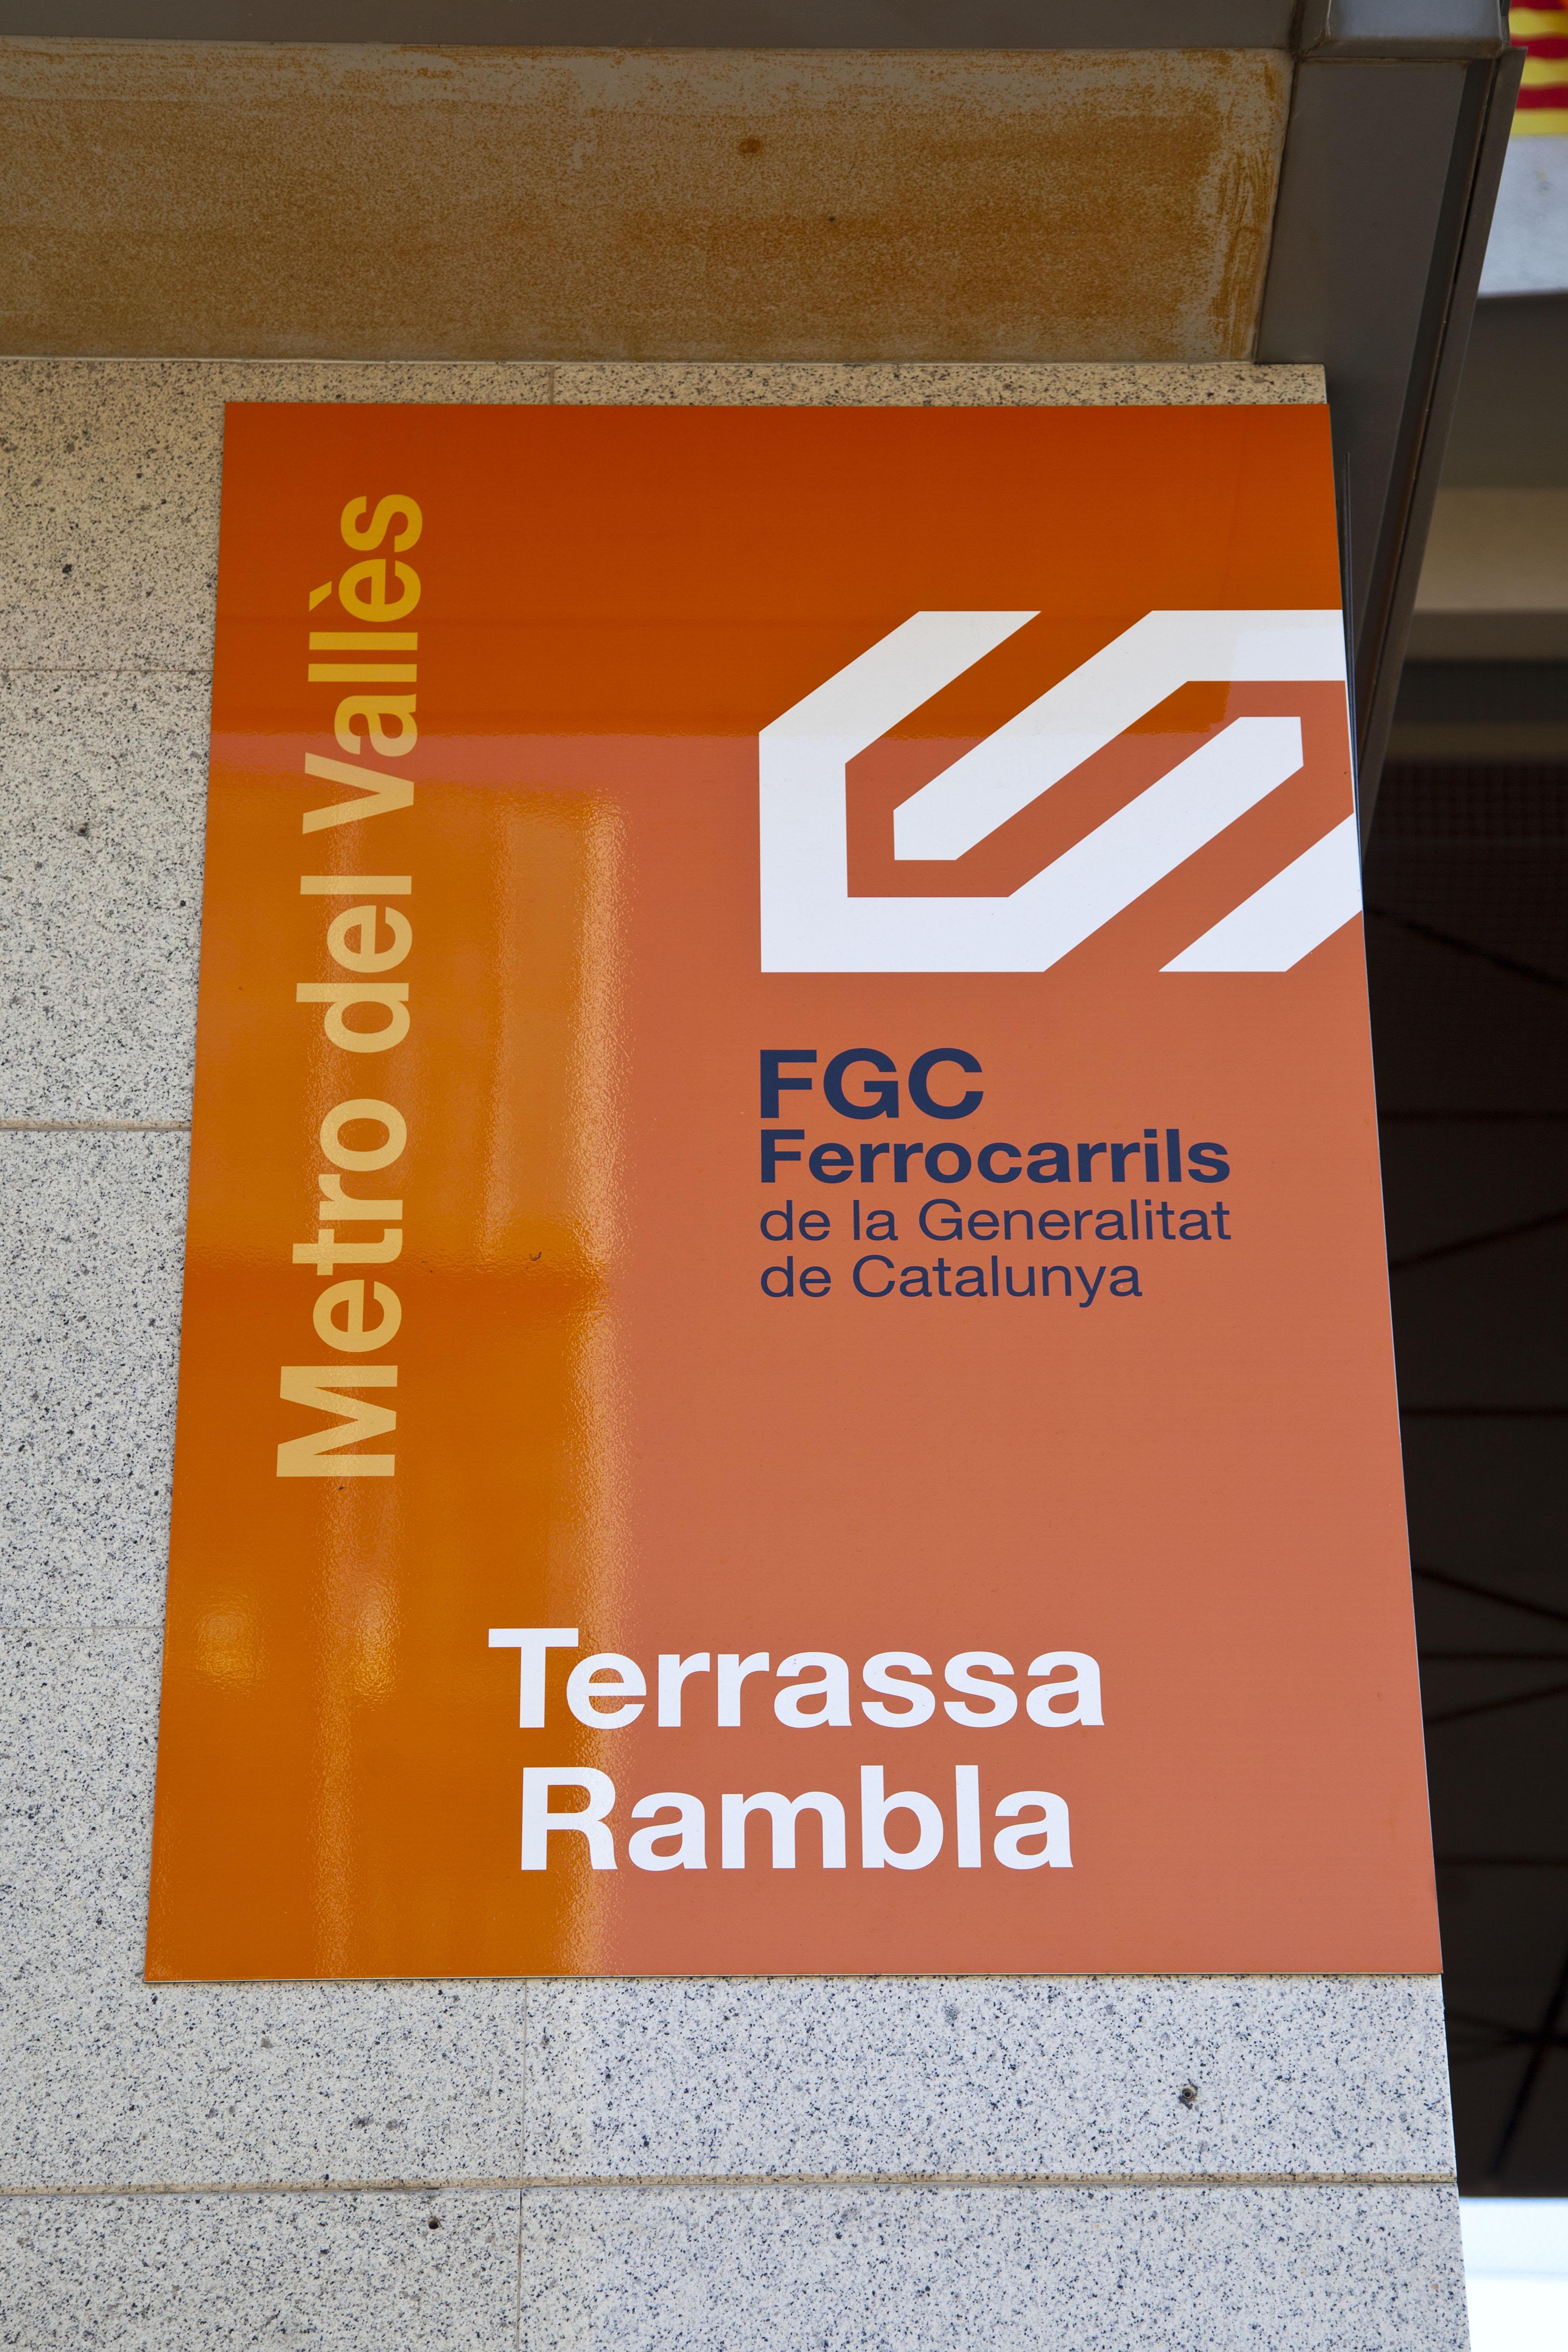 TERRASSA RAMBLA -FGC